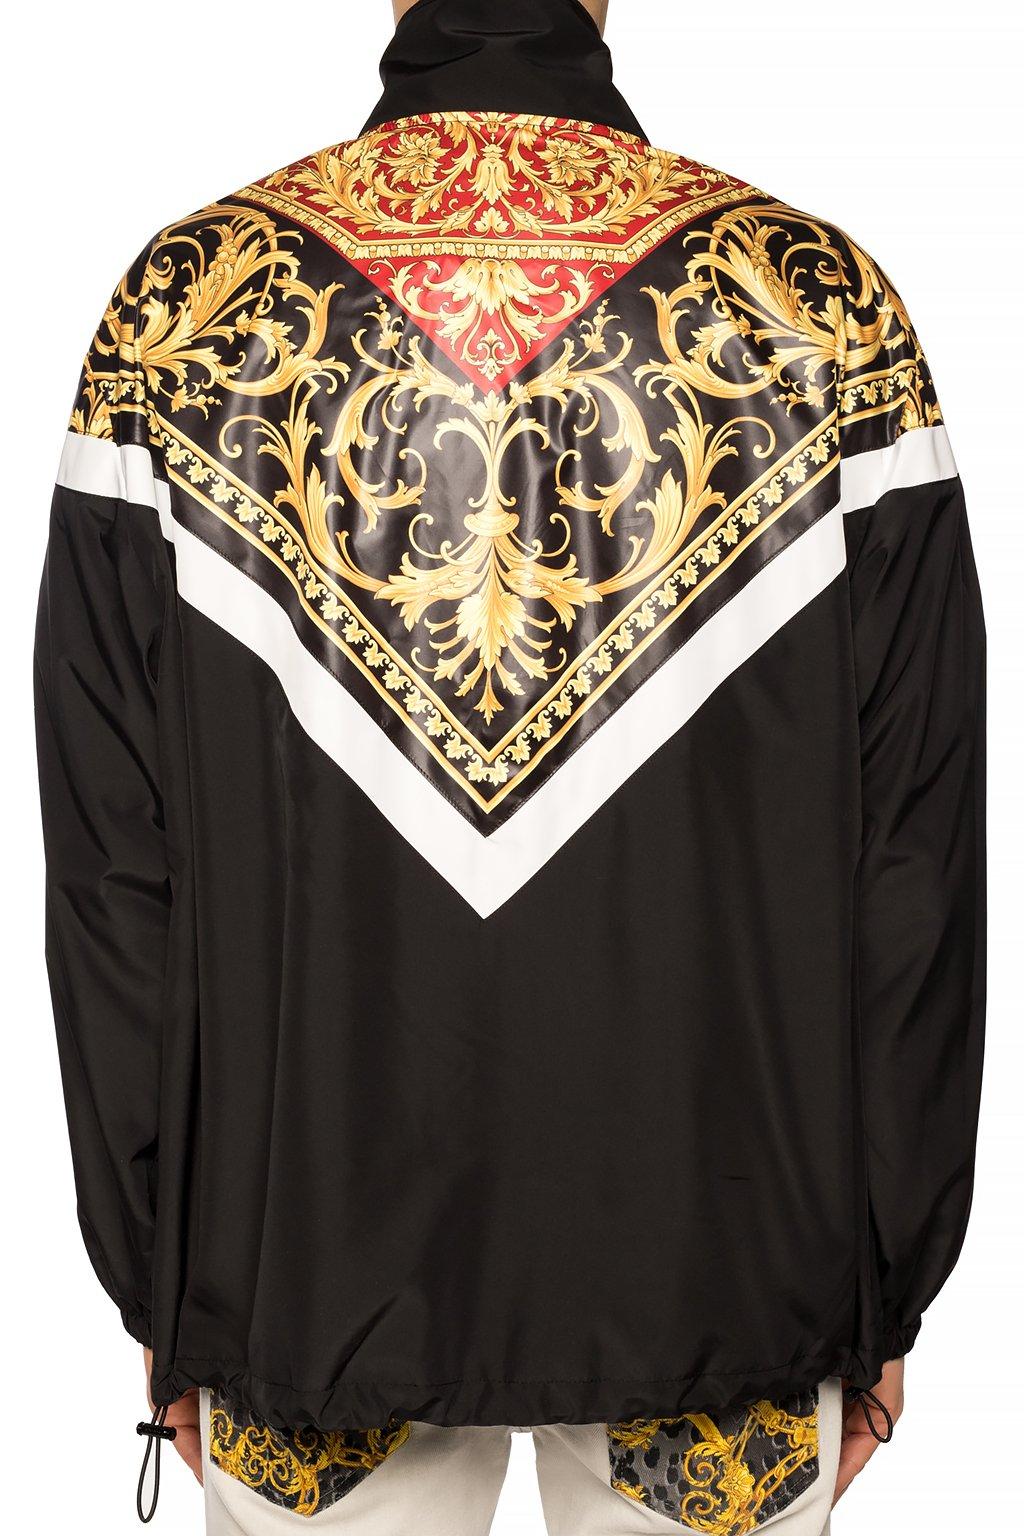 Versace Barocco-printed rainjacket